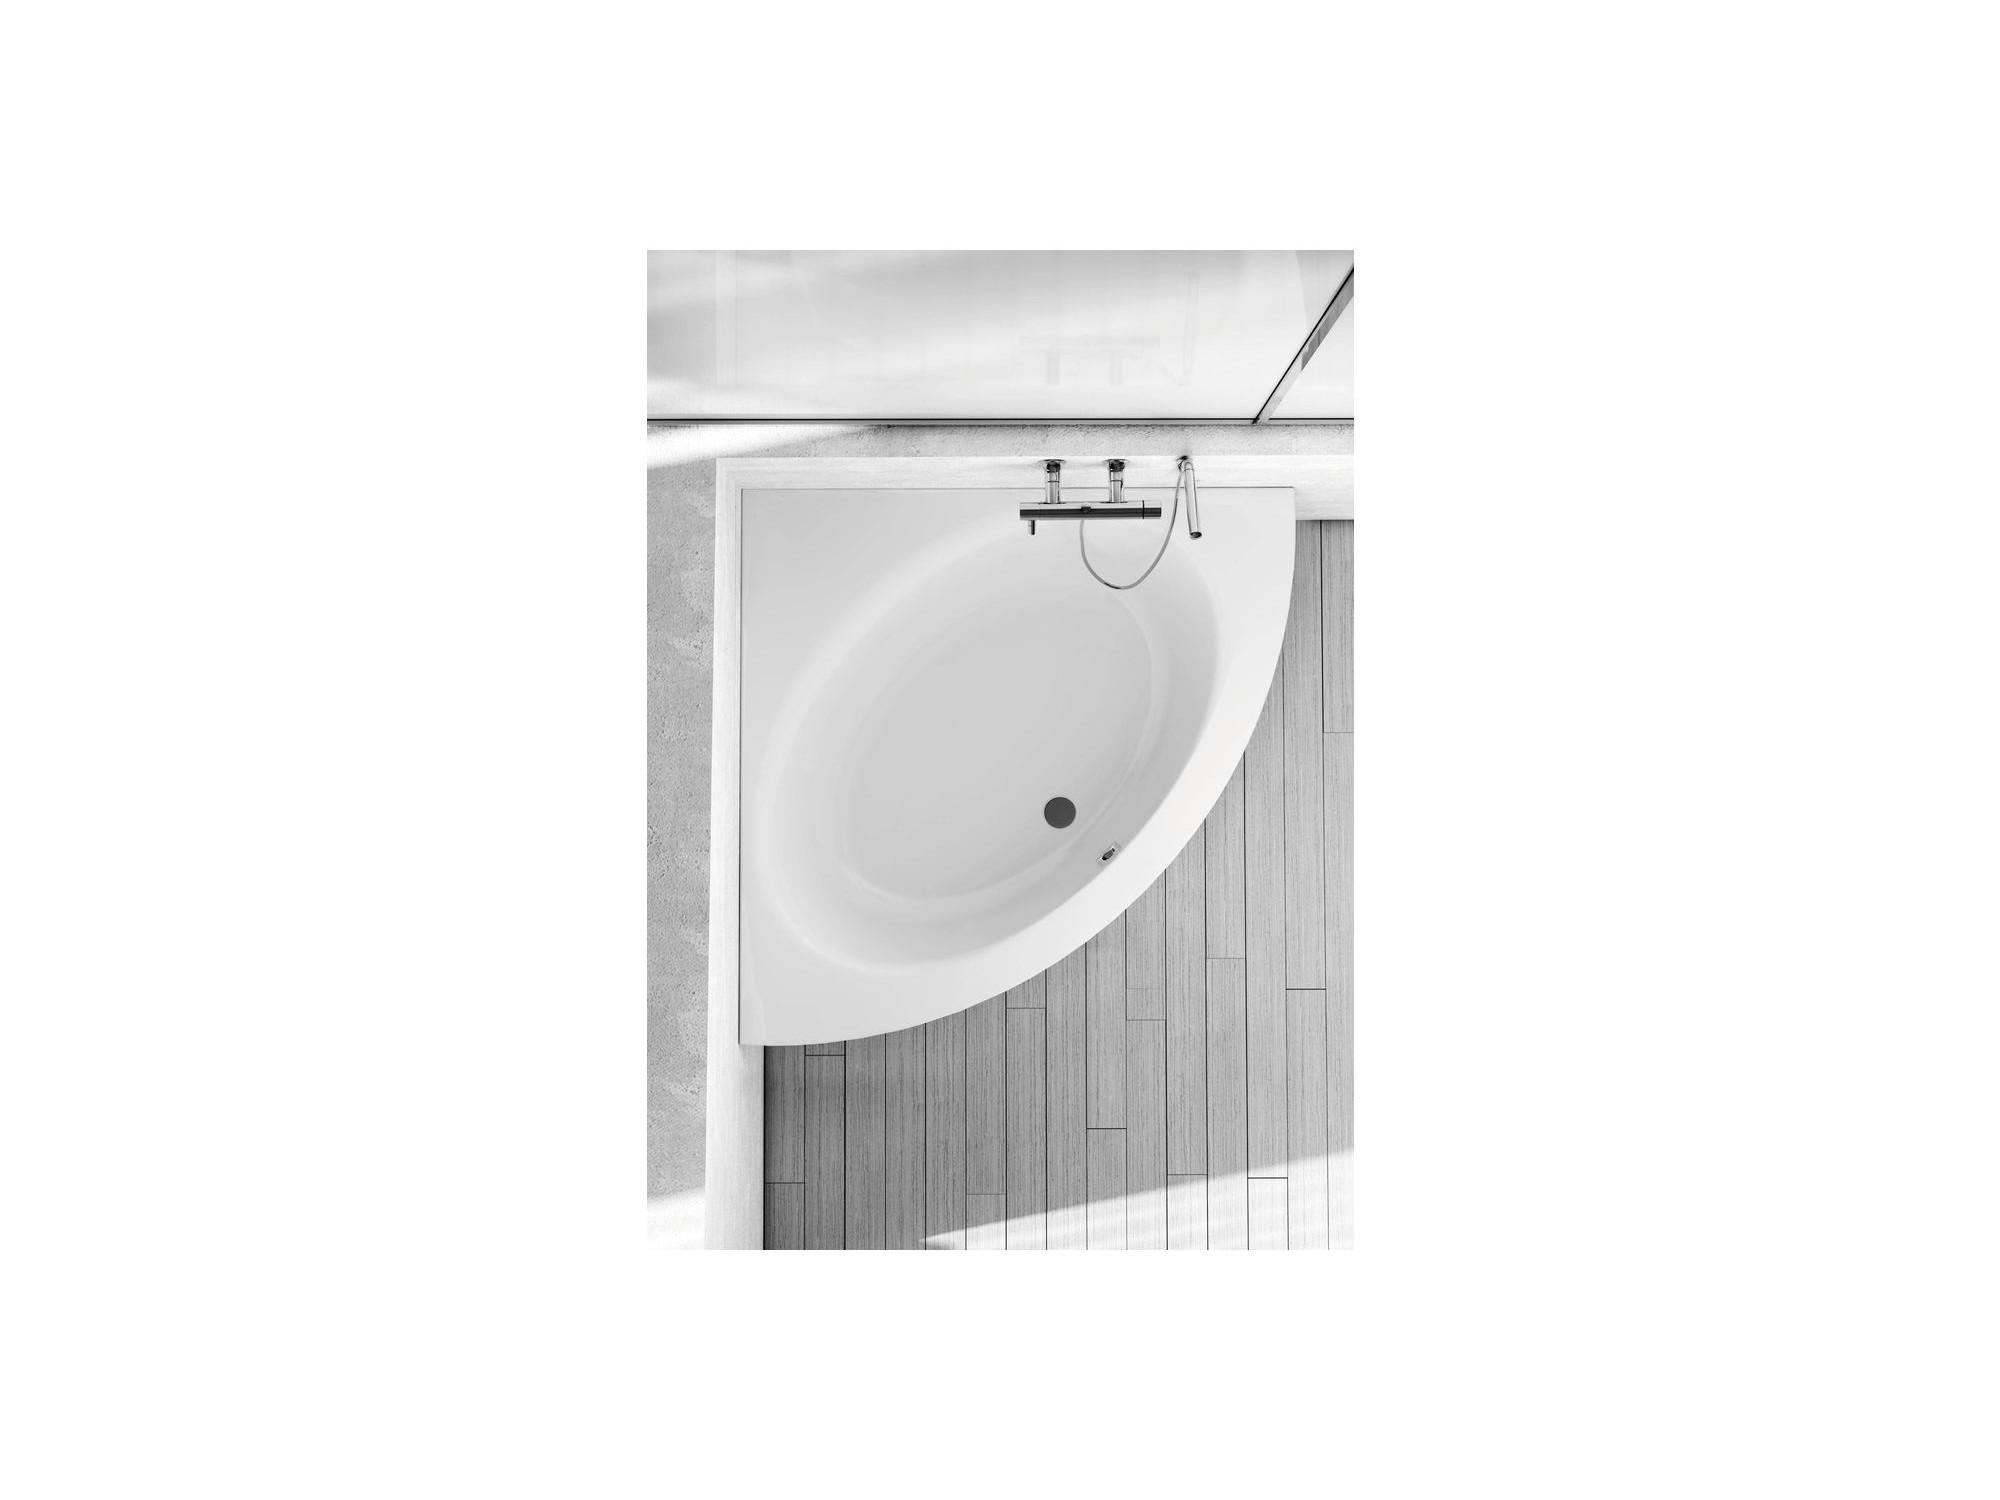 Vasca Da Bagno Misure Standard vasca da bagno angolare ideal standard connect air | bagnolandia